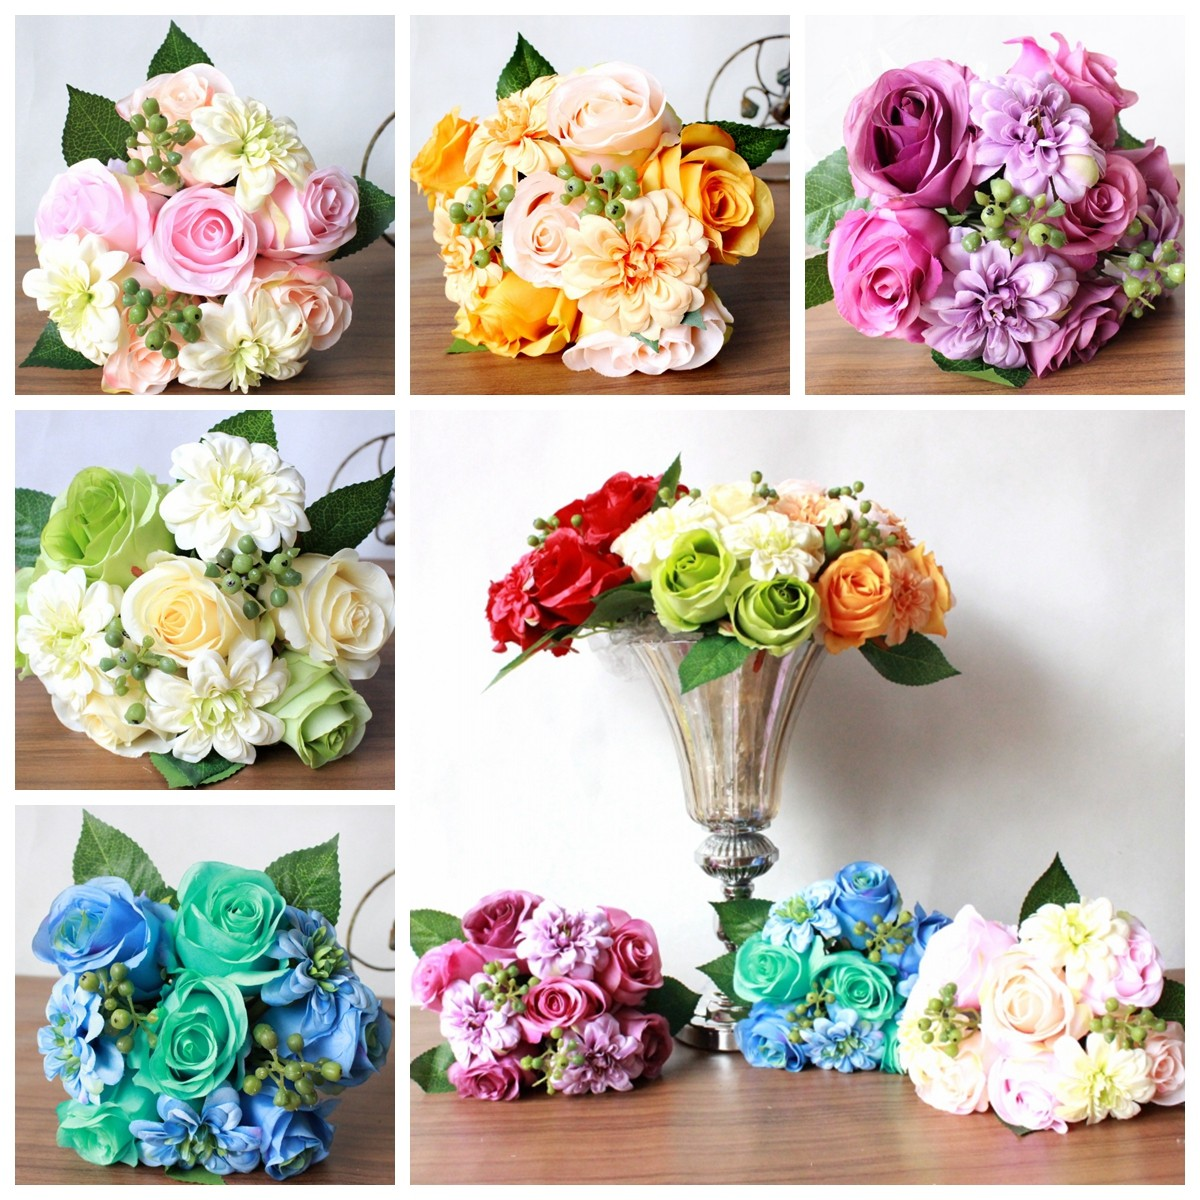 1 Bouquet 9 Heads Artificial Silk Roses Flowers Bouquet Home Wedding decoration Bridal Party Decor